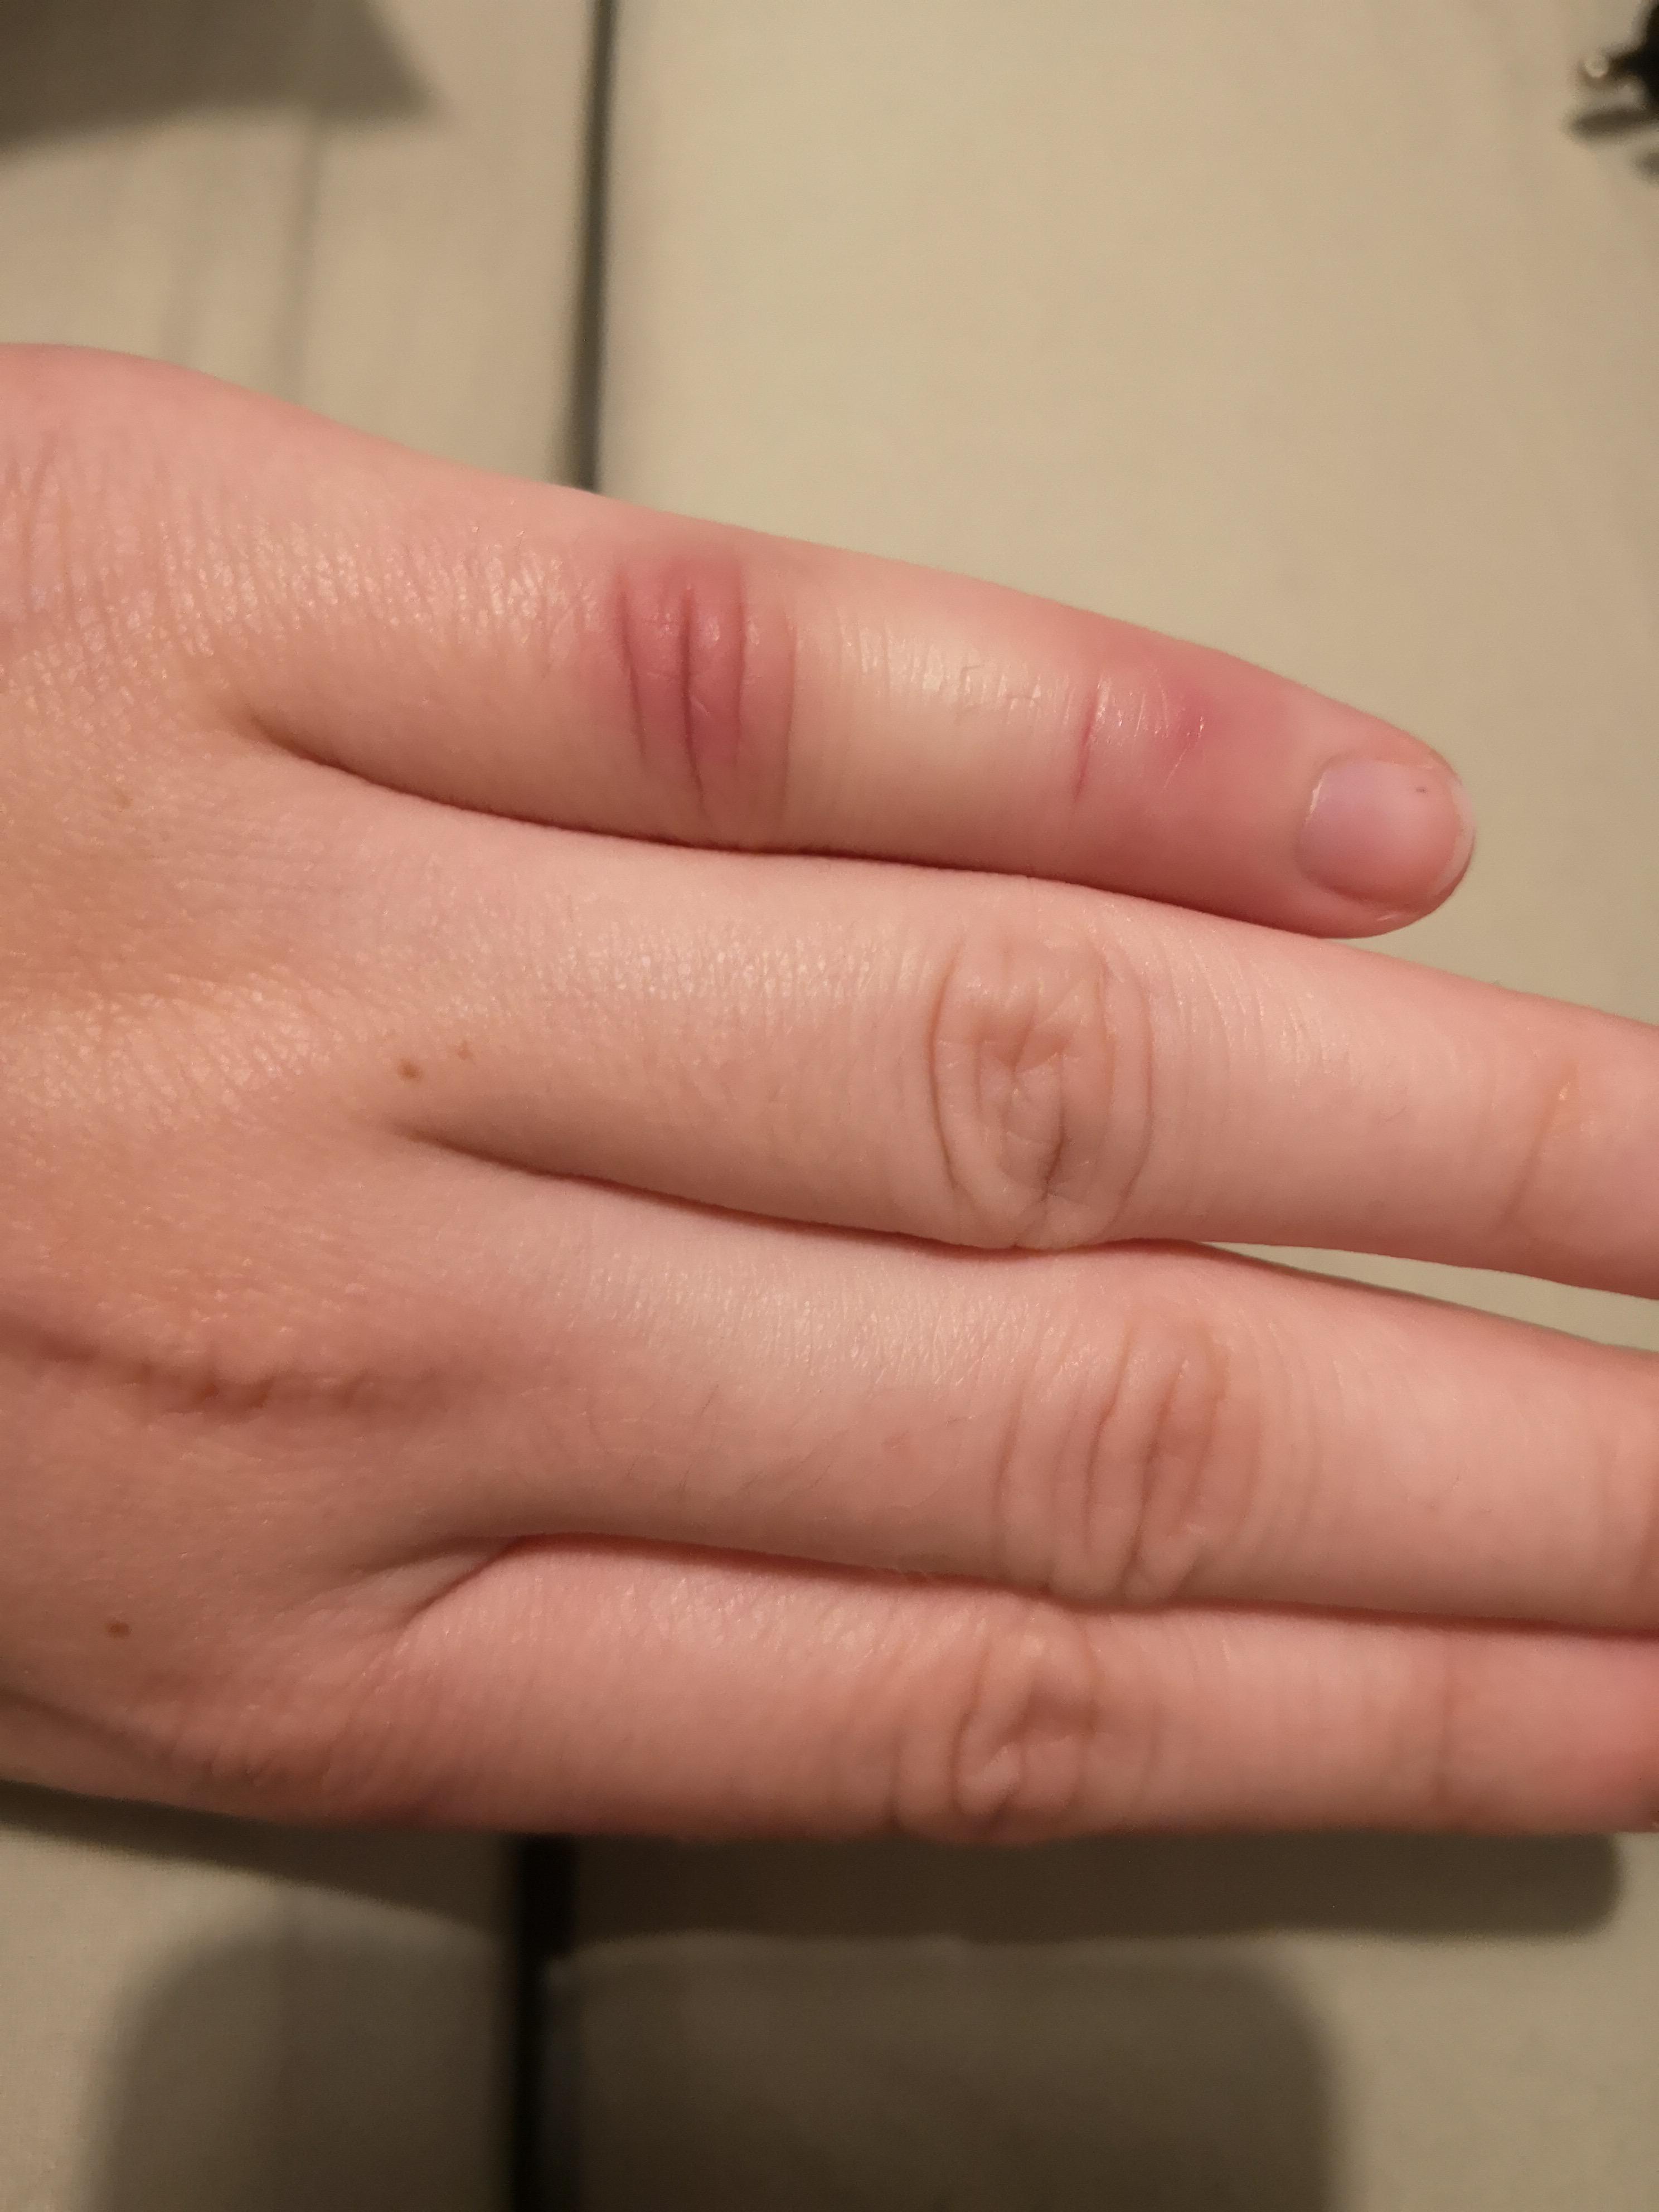 prellung finger